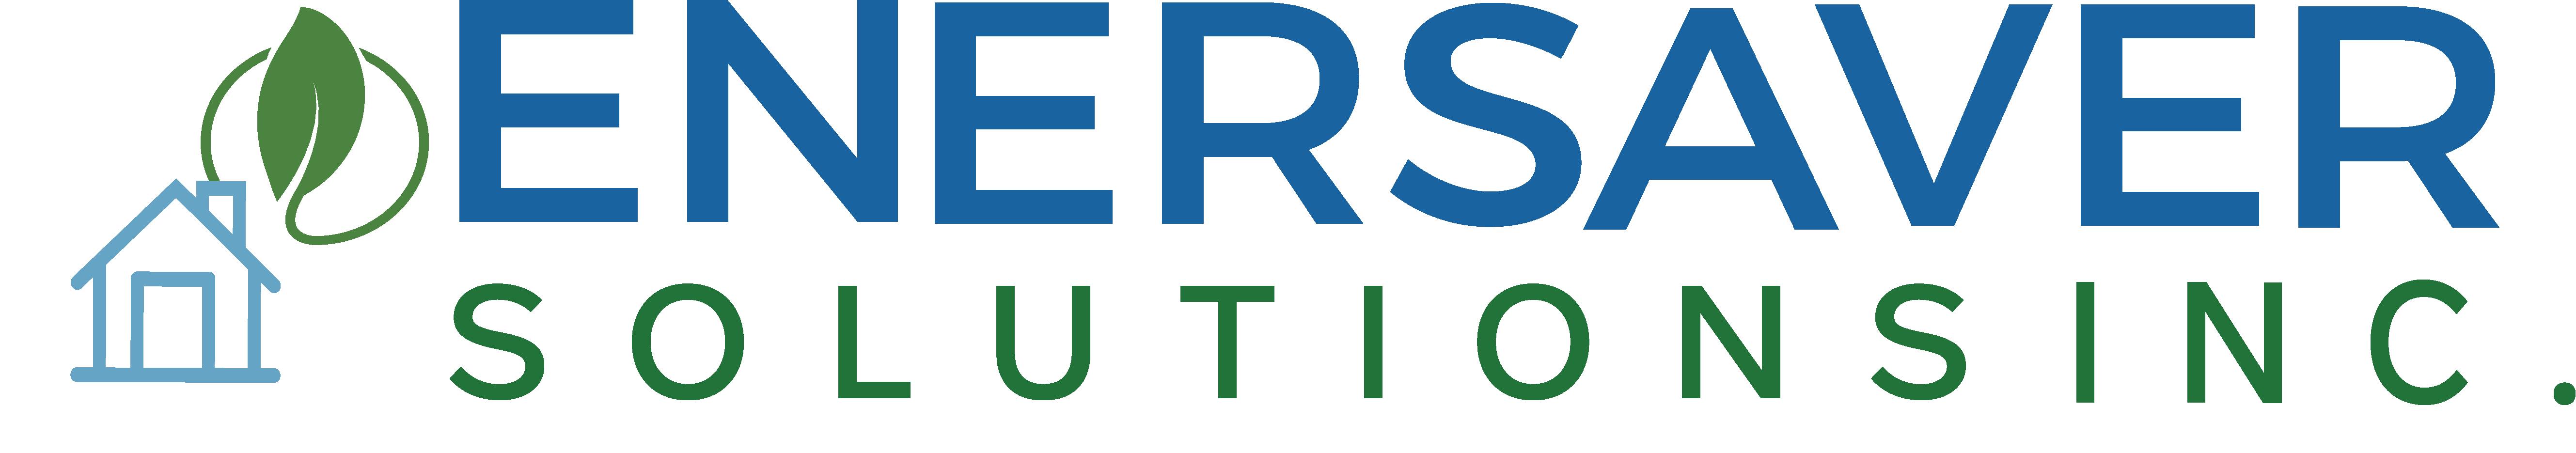 EnerSaver Solutions Inc.